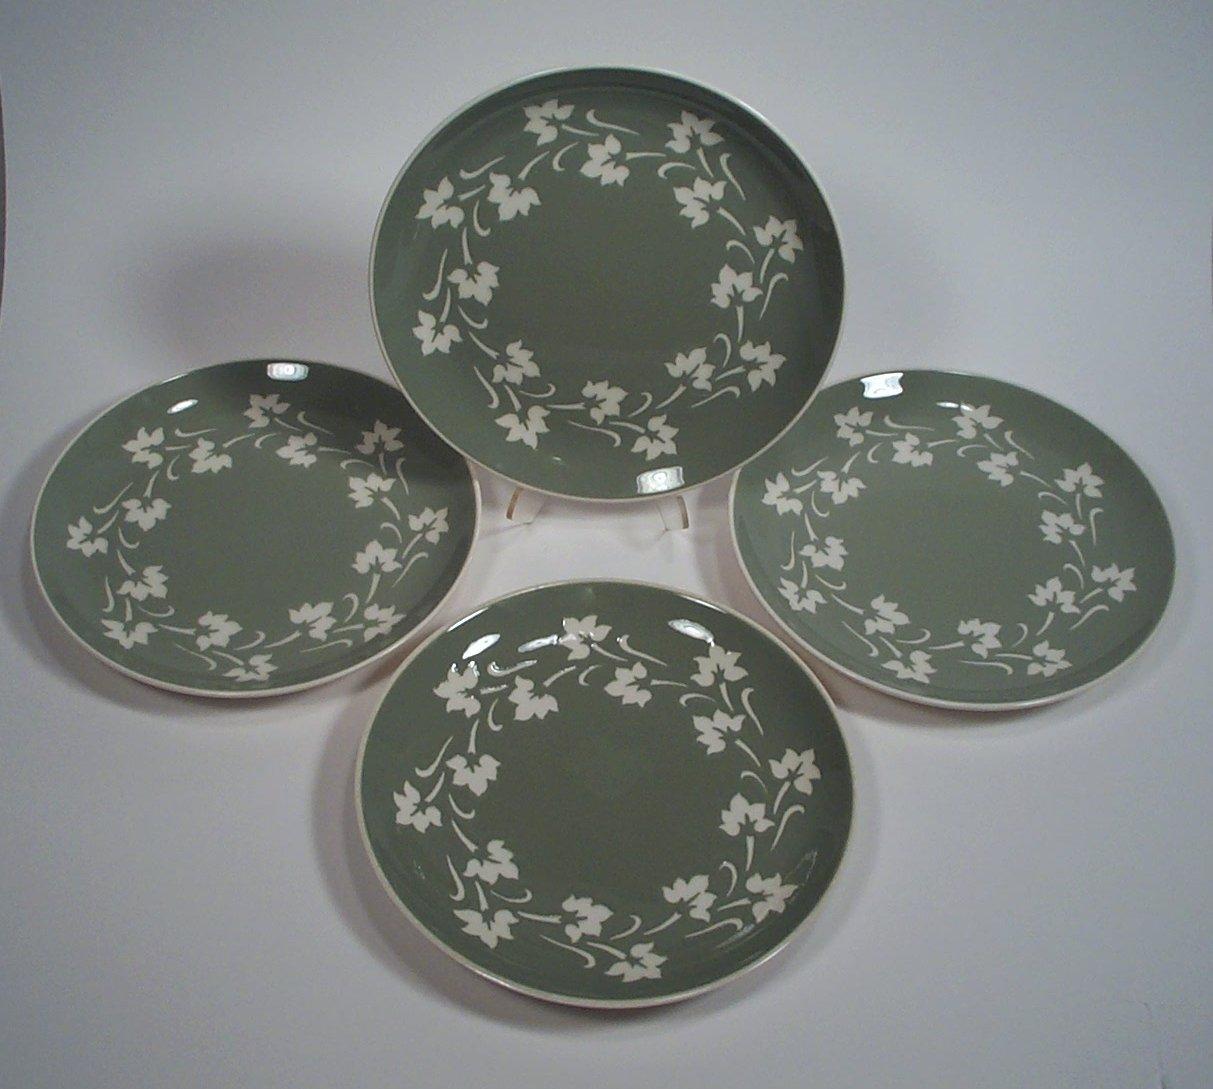 "Harkerware Ivy Wreath Salad Plates Set of 4 by Harker 7 3/4"""